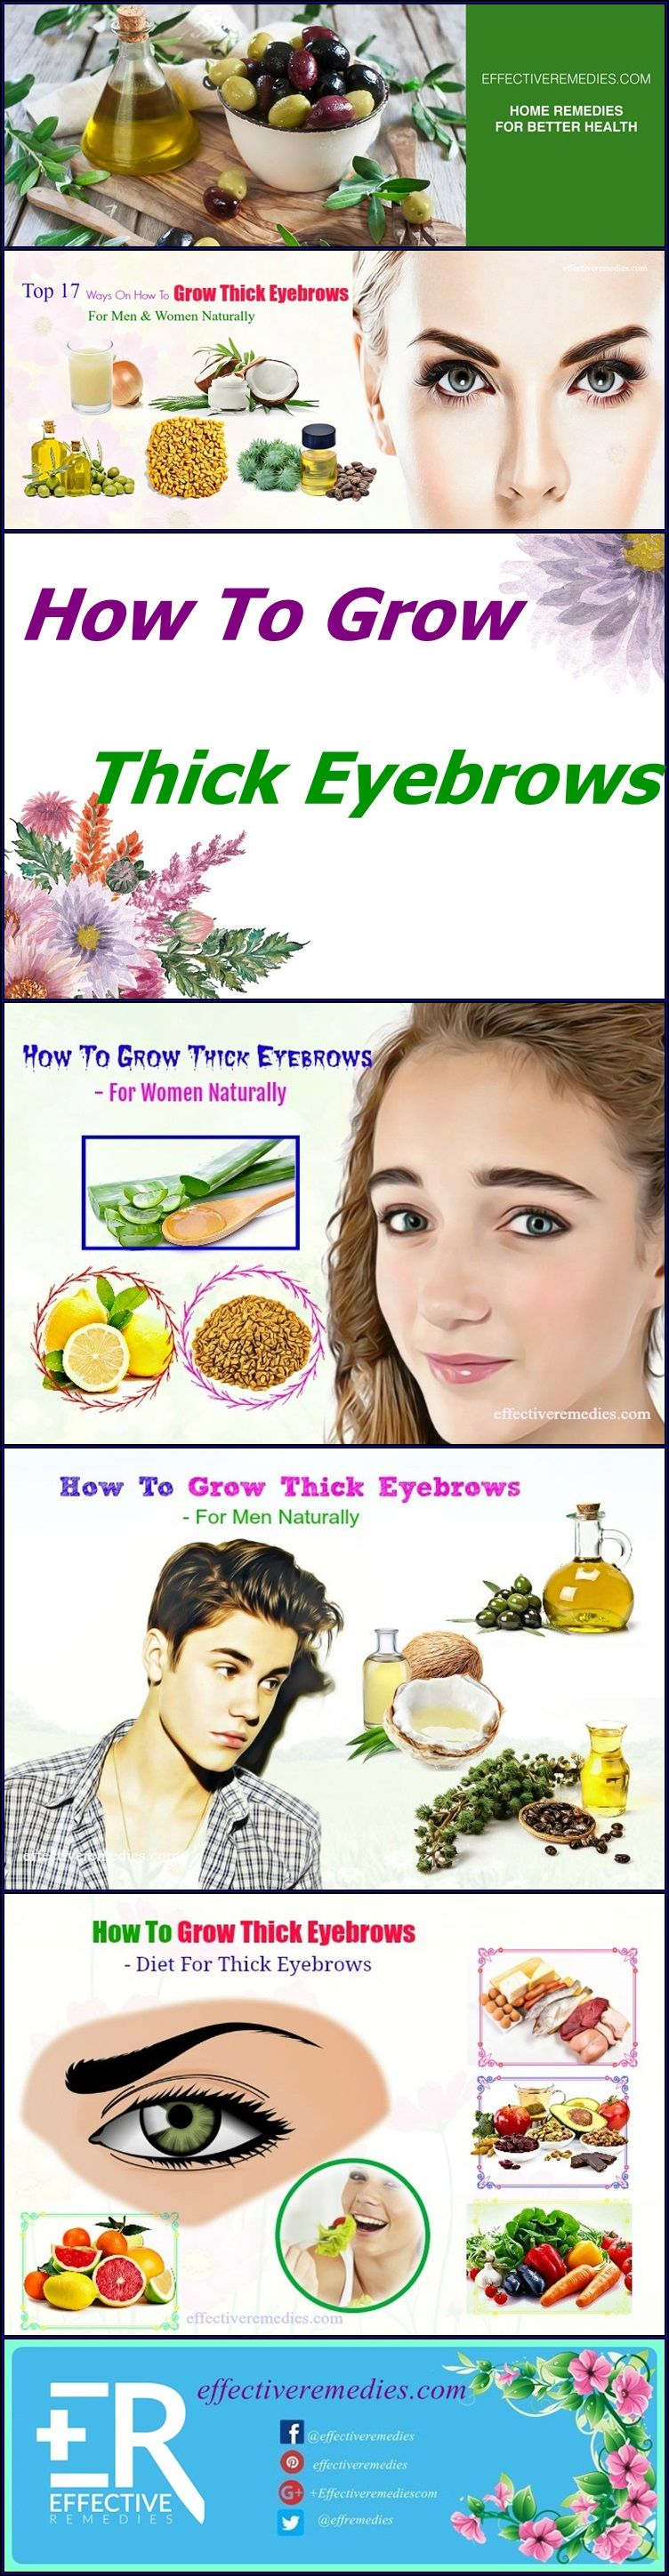 17 Best Ways For Men & Women To Make Eyebrows Thicker ...